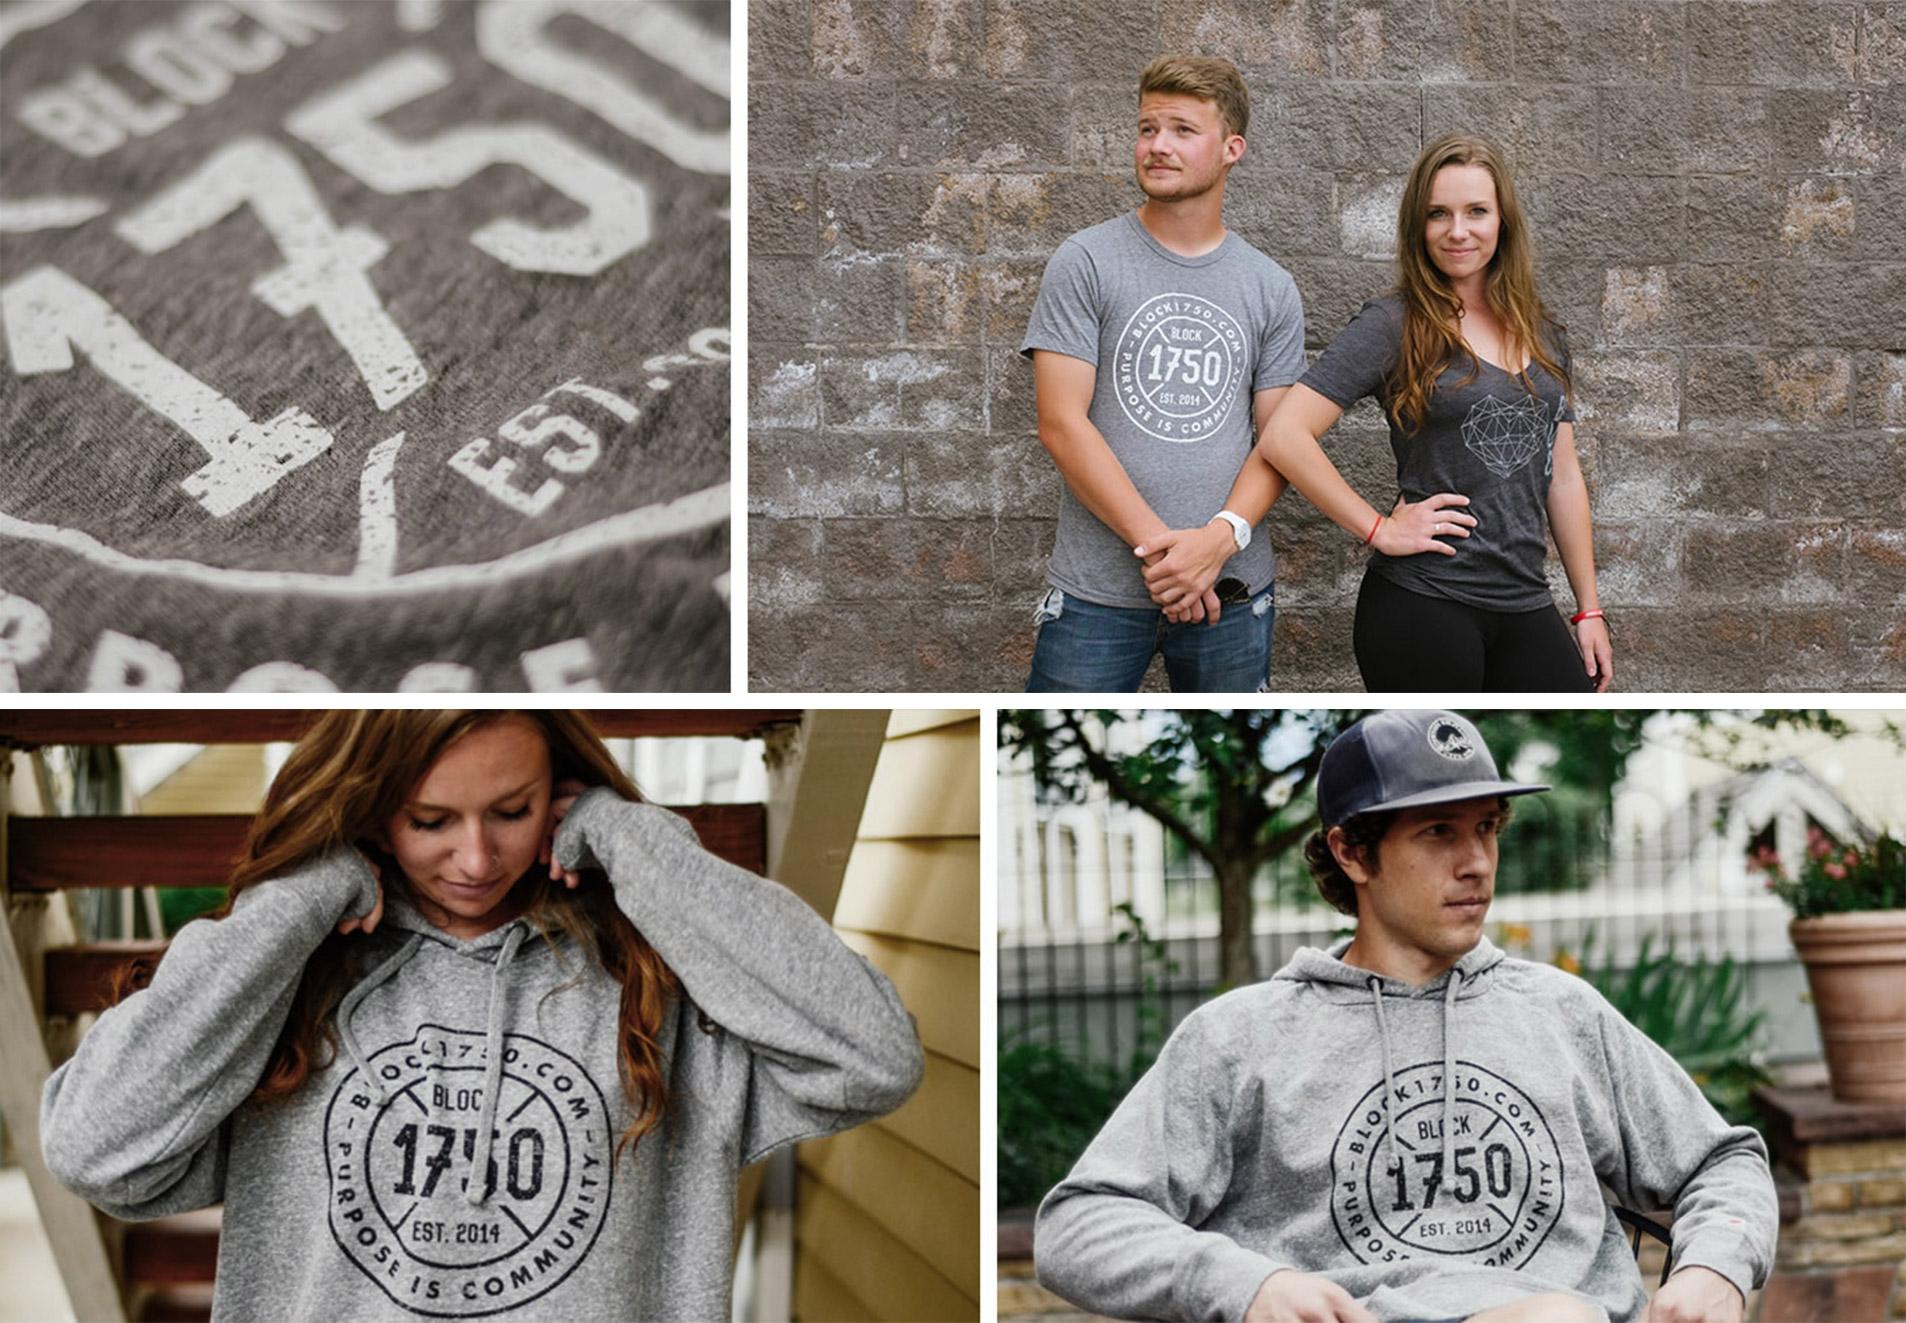 apparel design for block1750